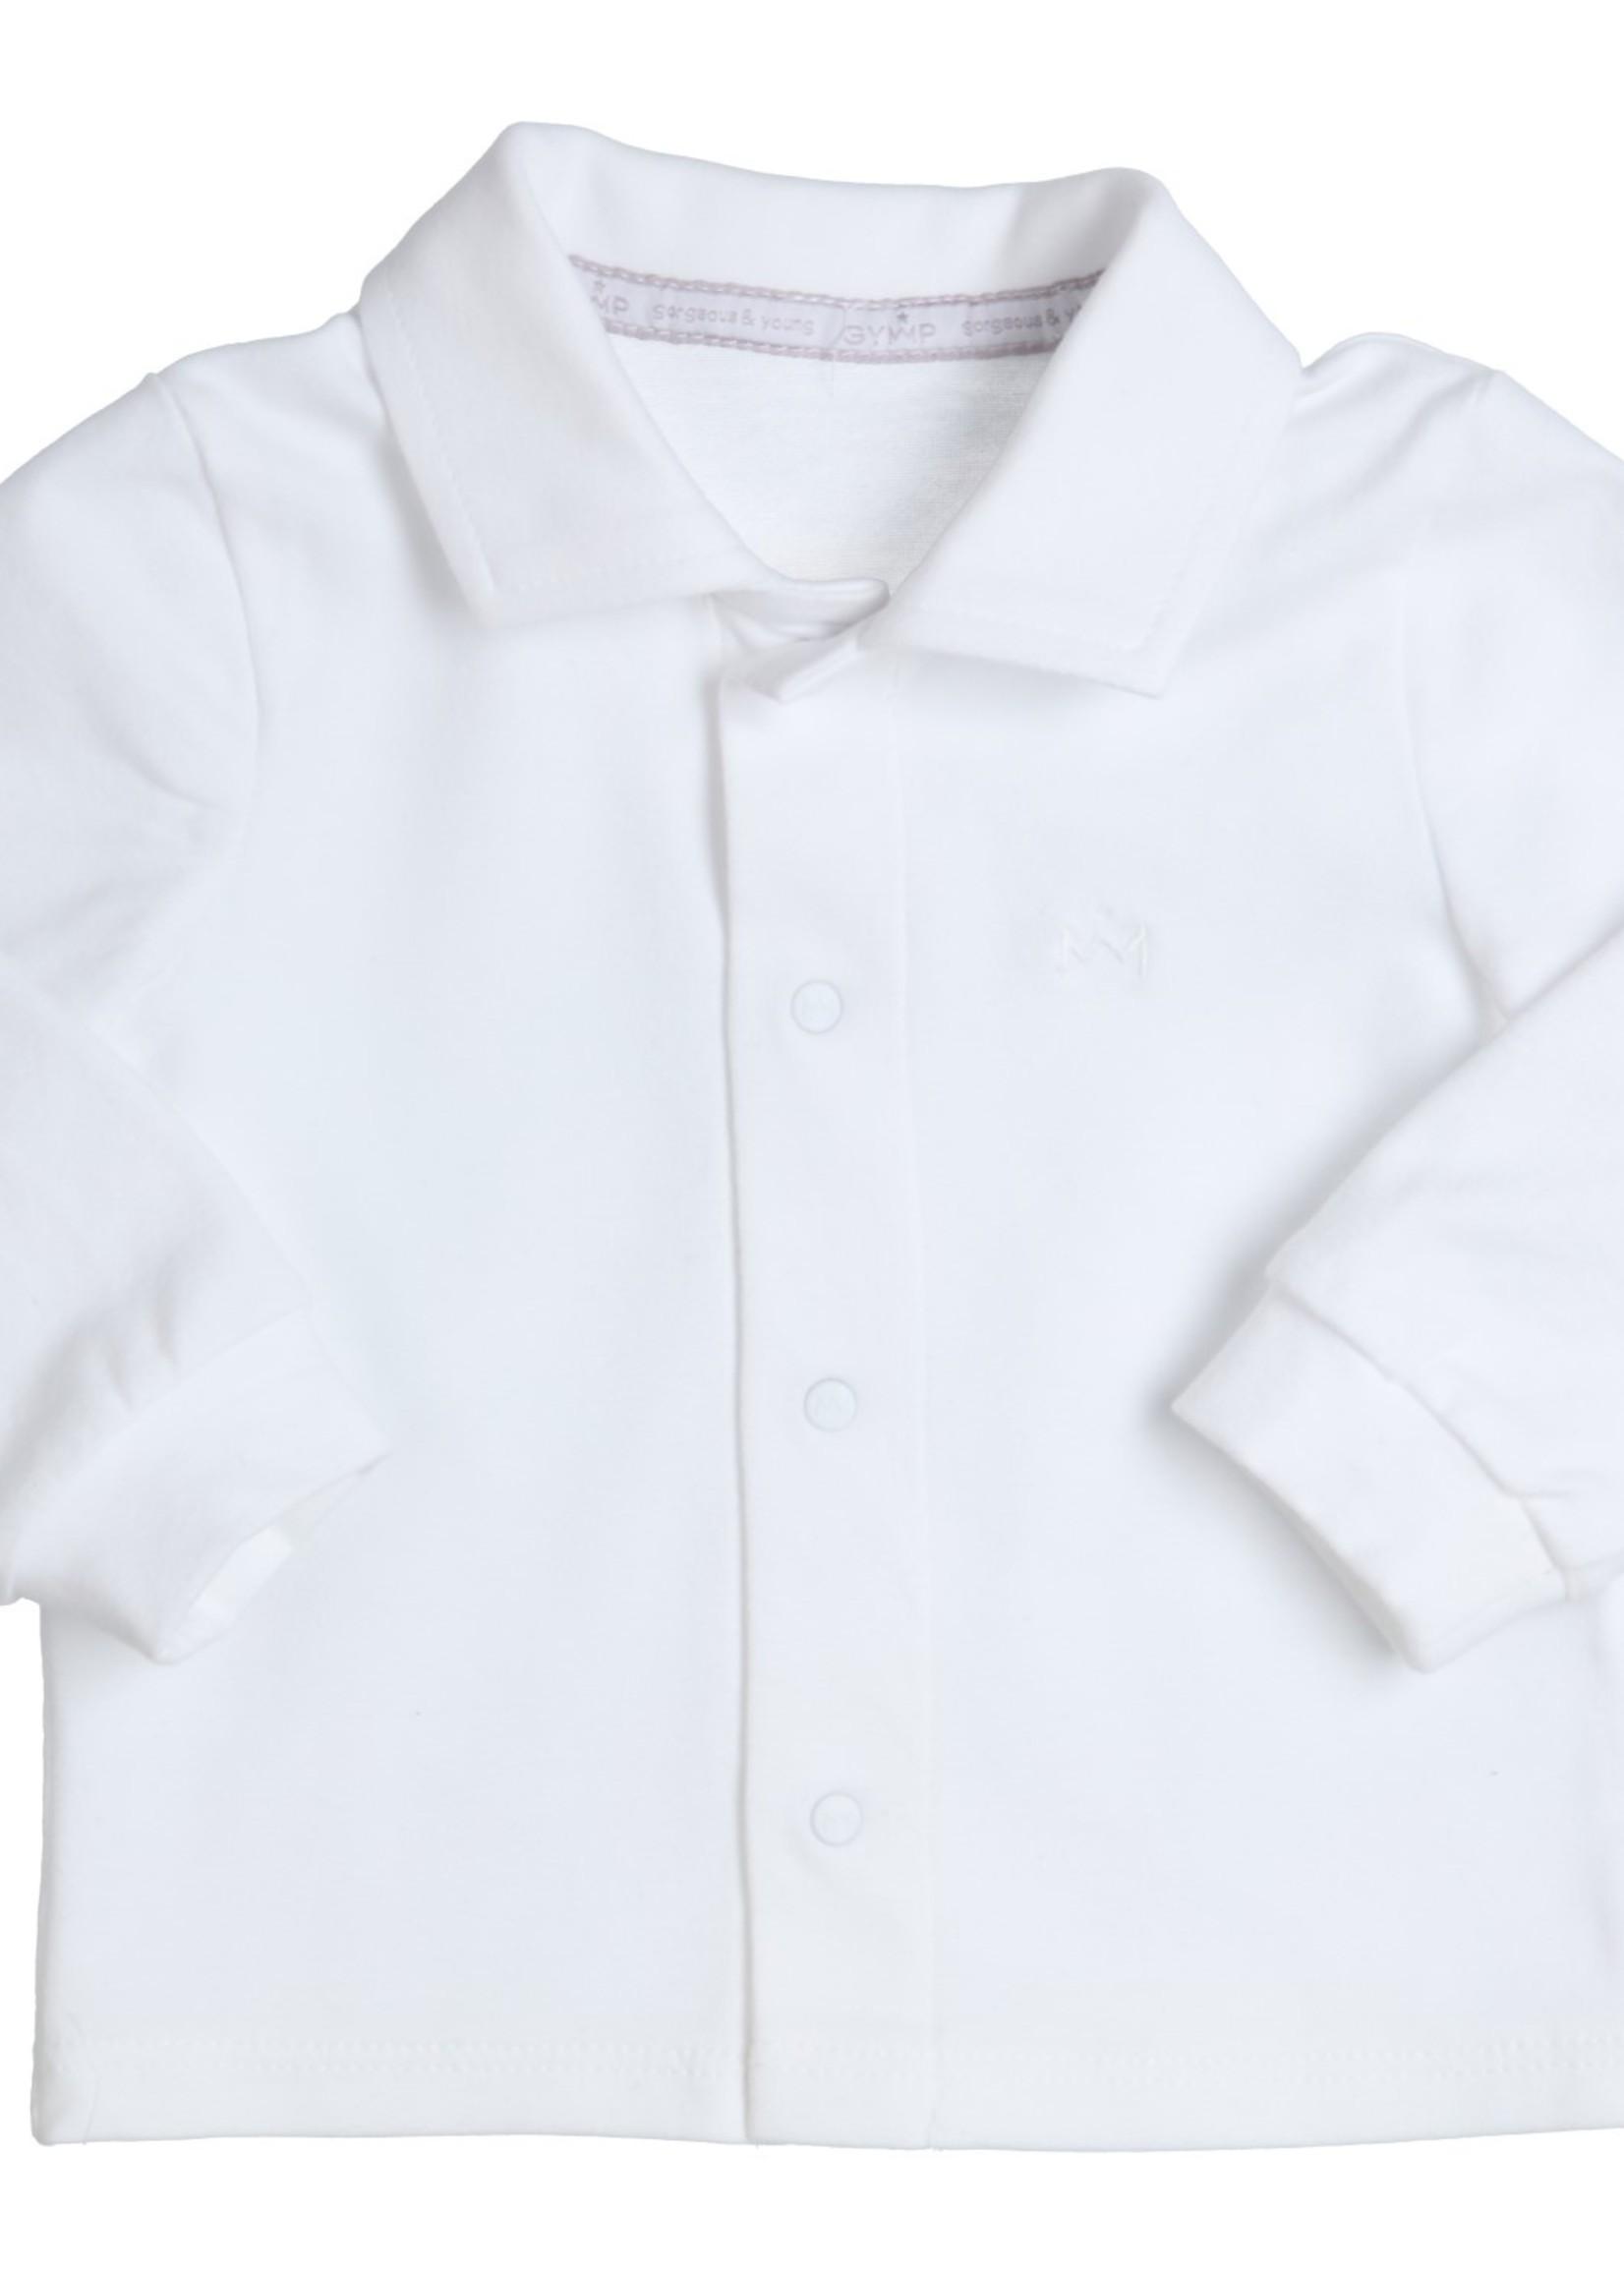 Gymp Gymp shirt met knoopjes wit